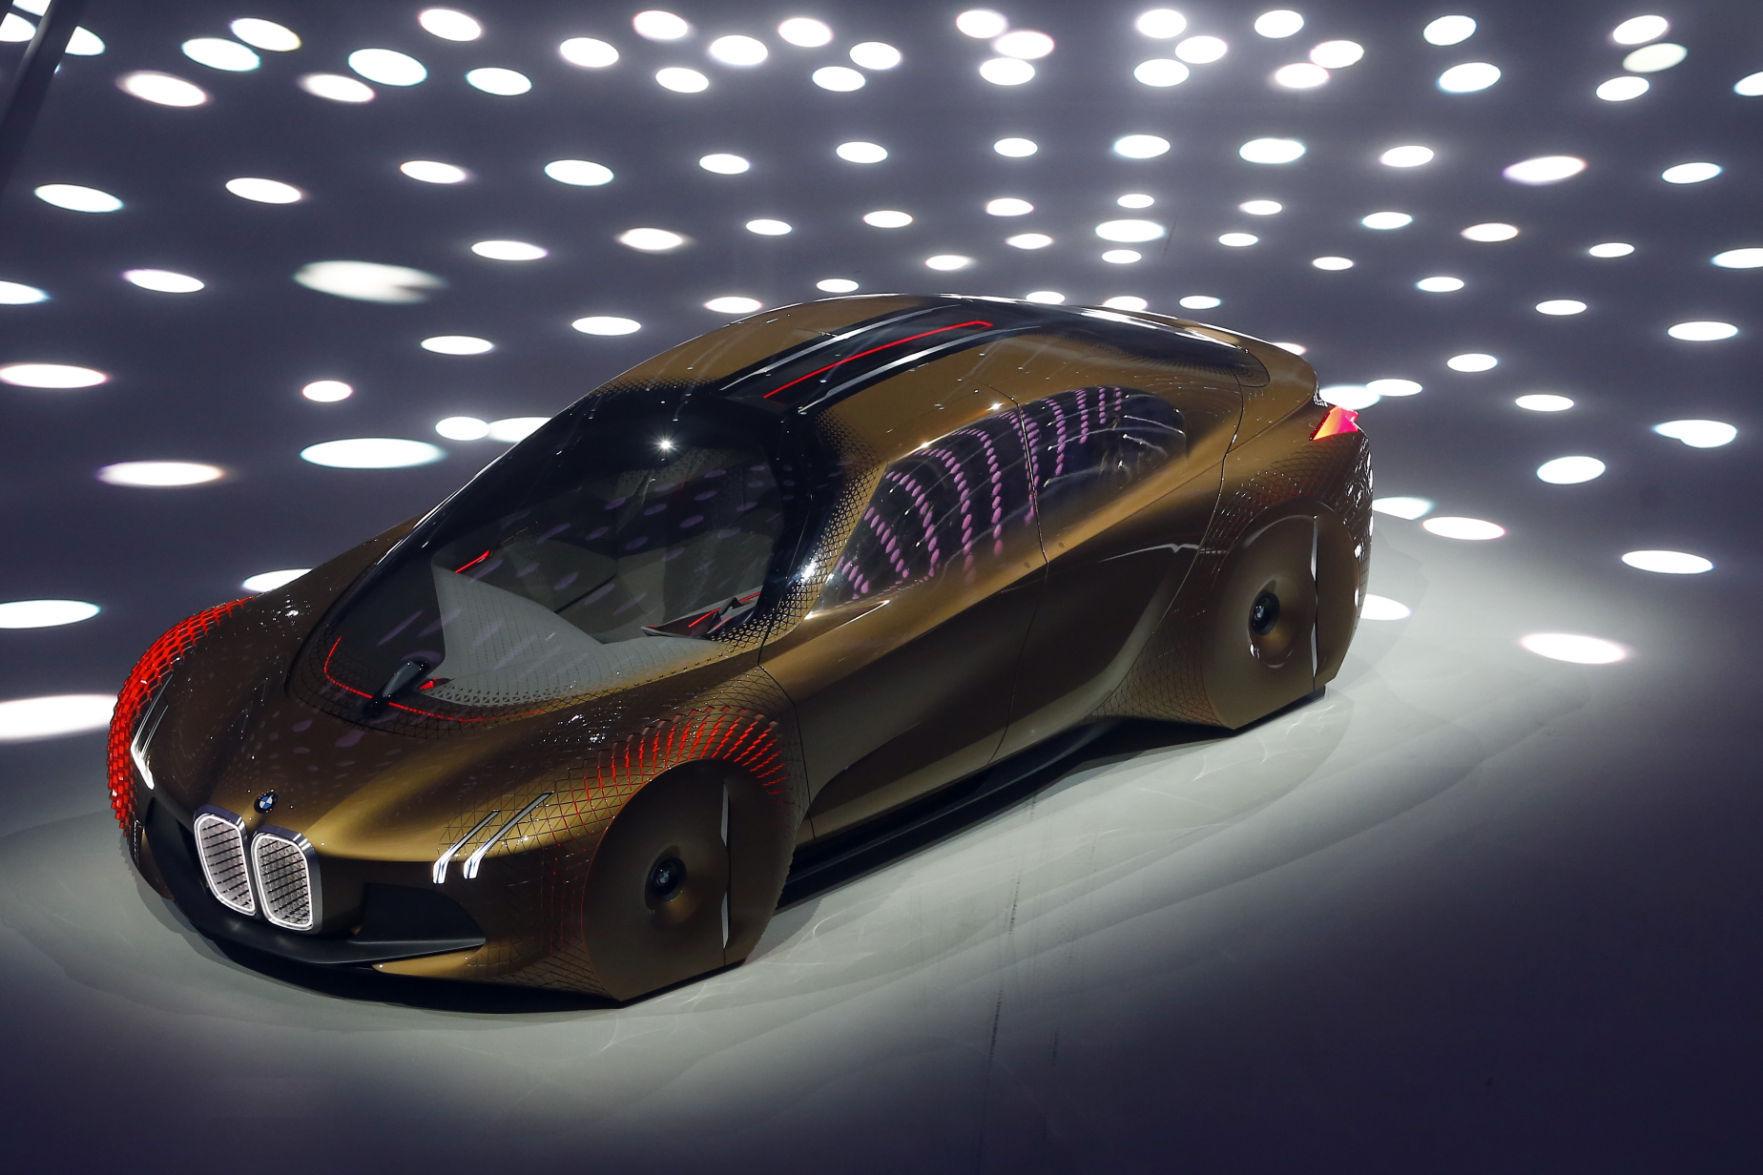 BMW Shows Off Concept Car